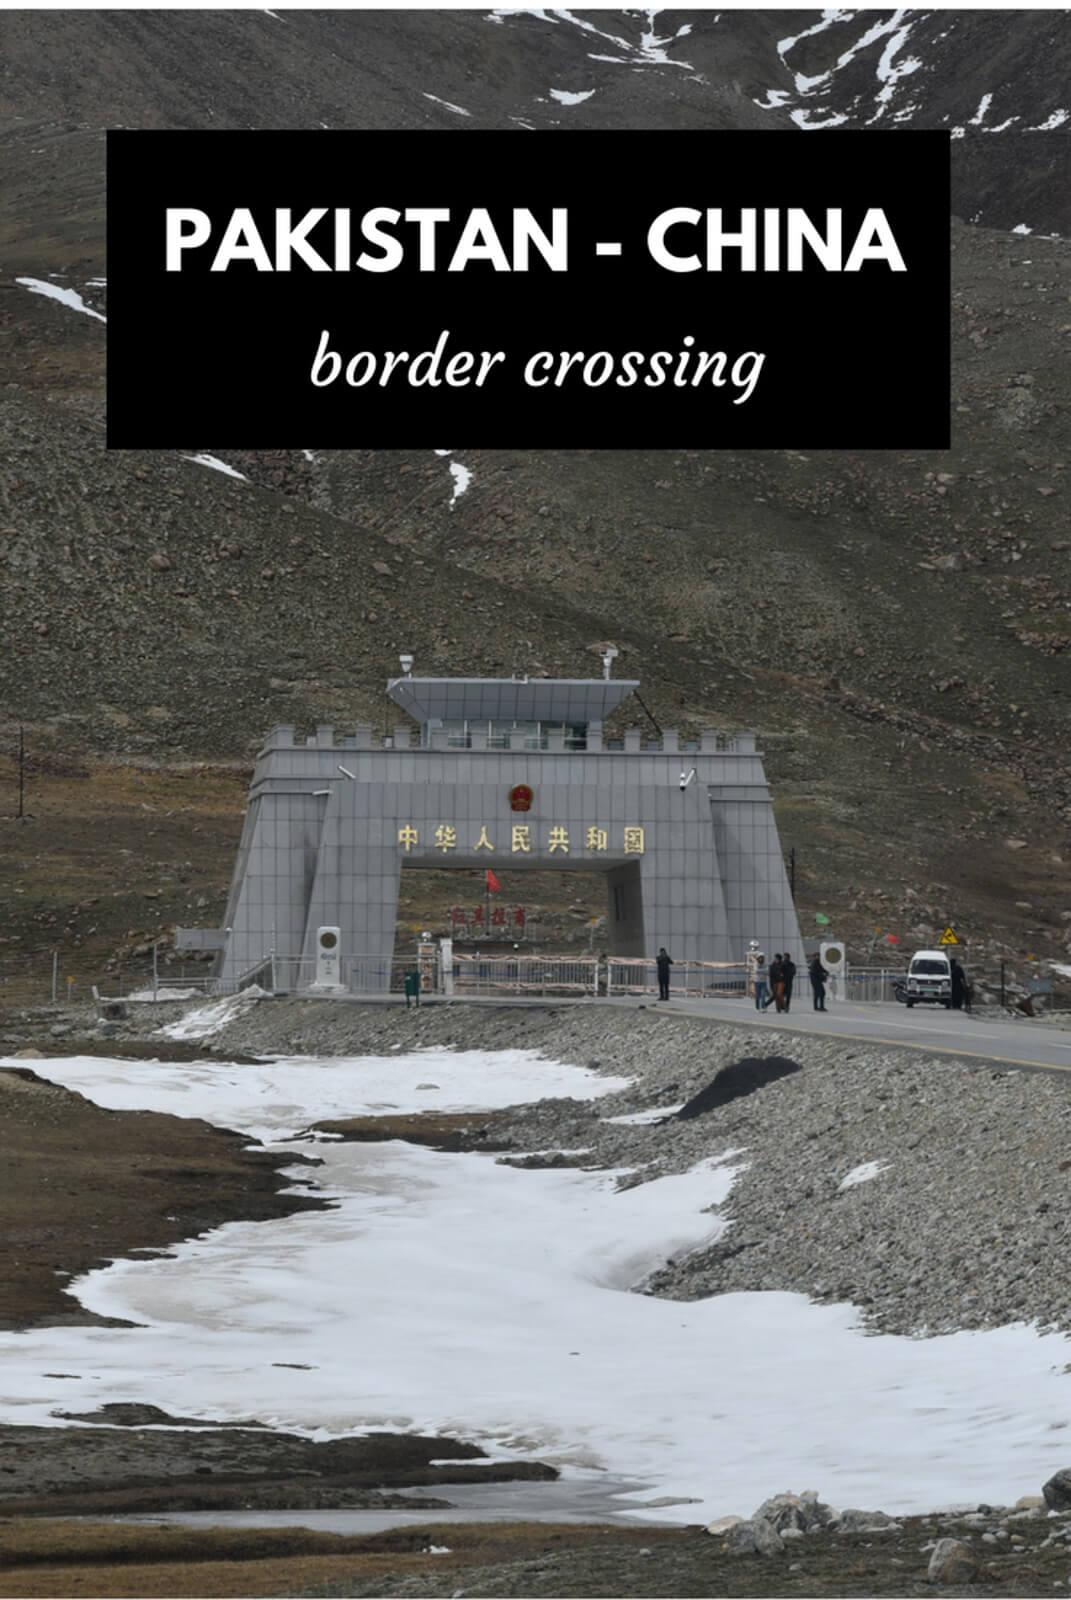 Cruzar la frontera Pakistán a China en Khunjerab Pass